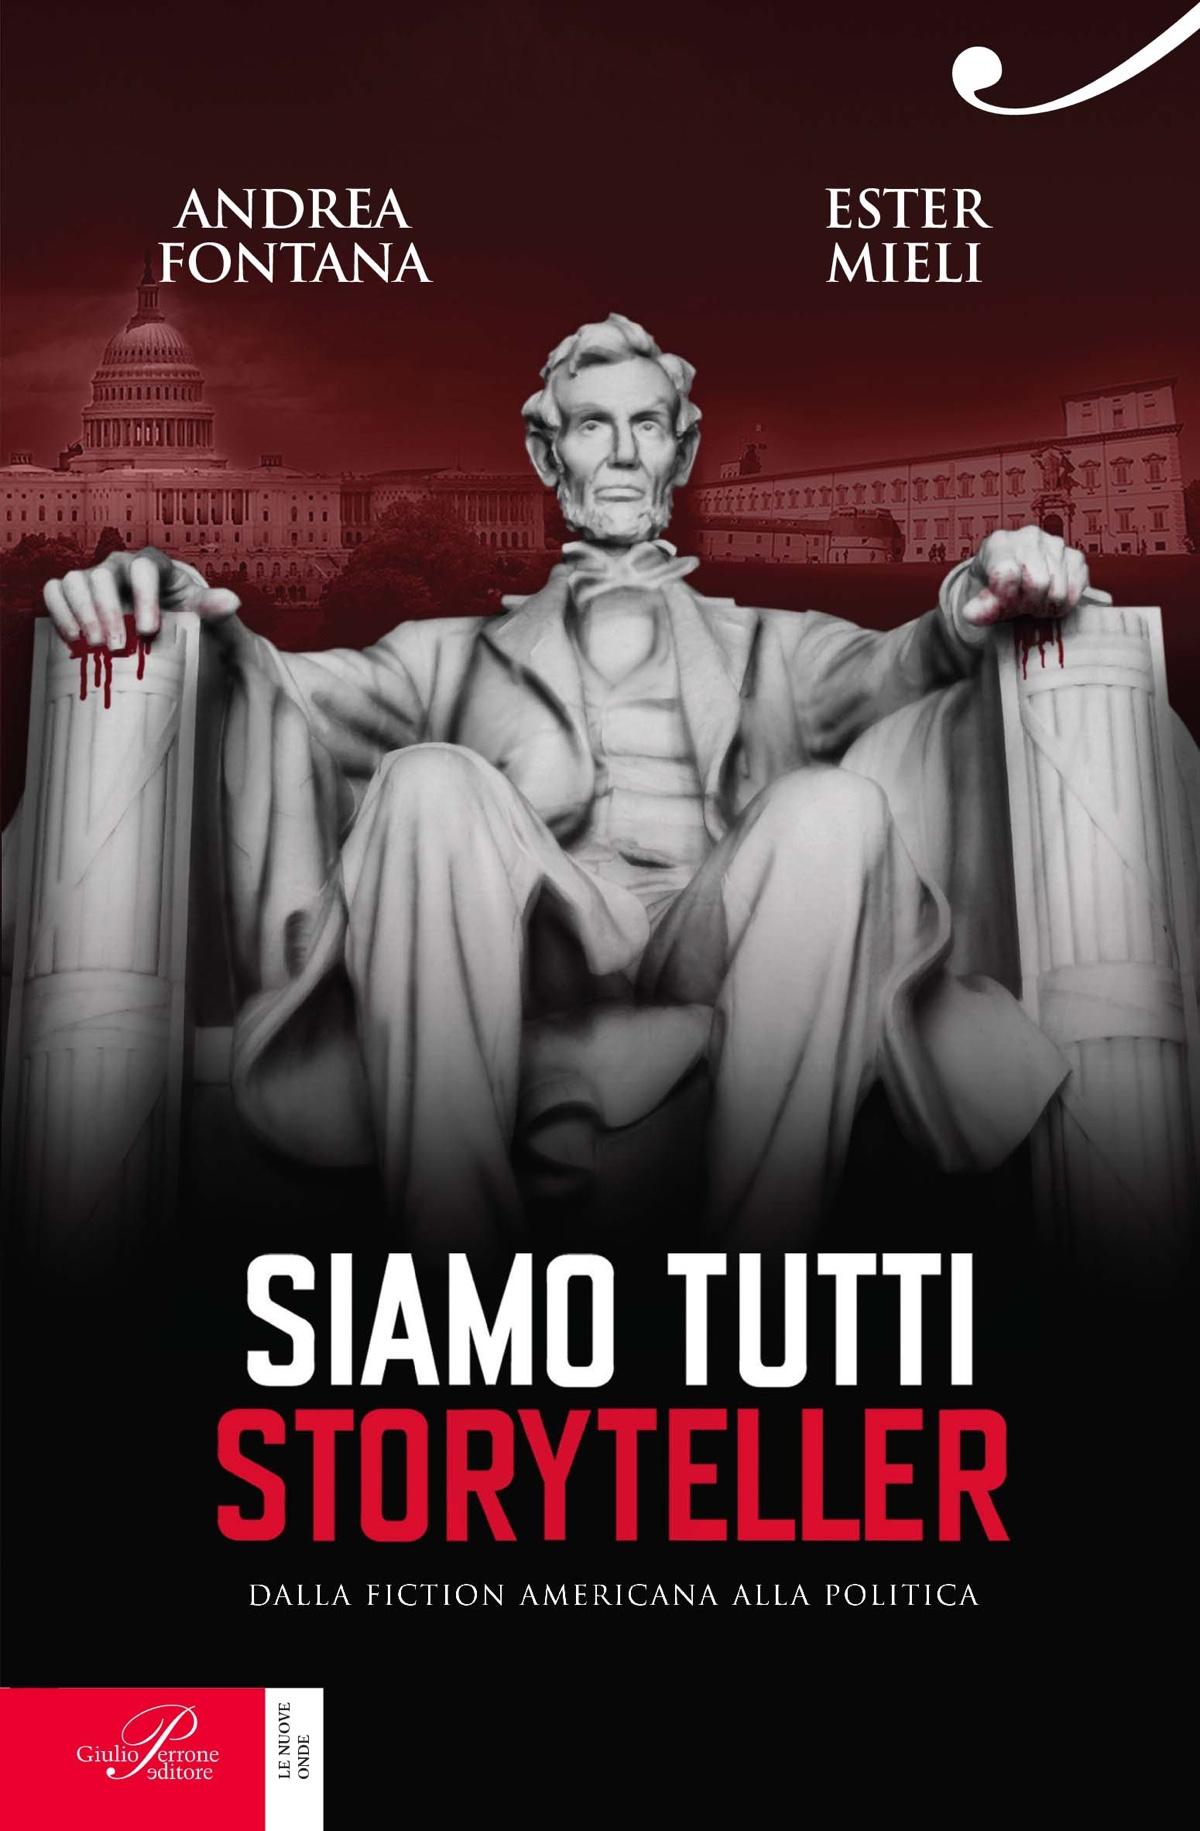 Siamo tutti storyteller